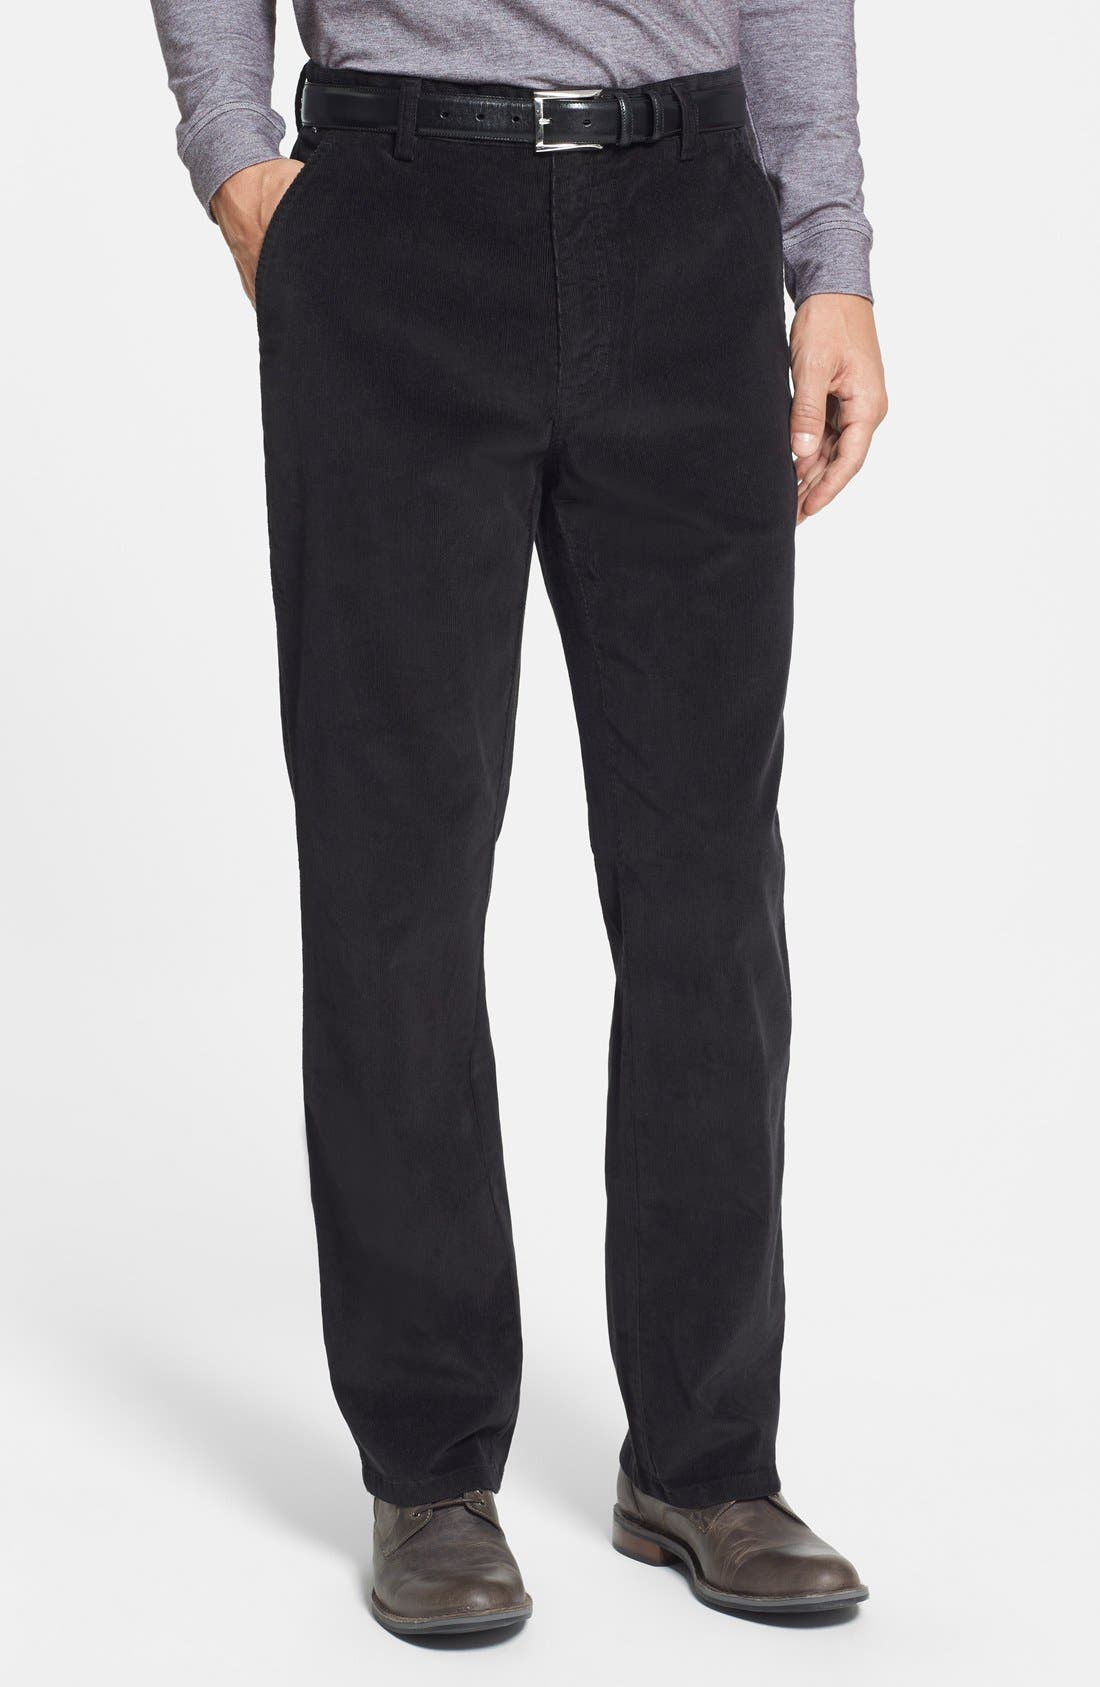 'Walker' Flat Front Straight Leg Corduroy Pants, Main, color, 001